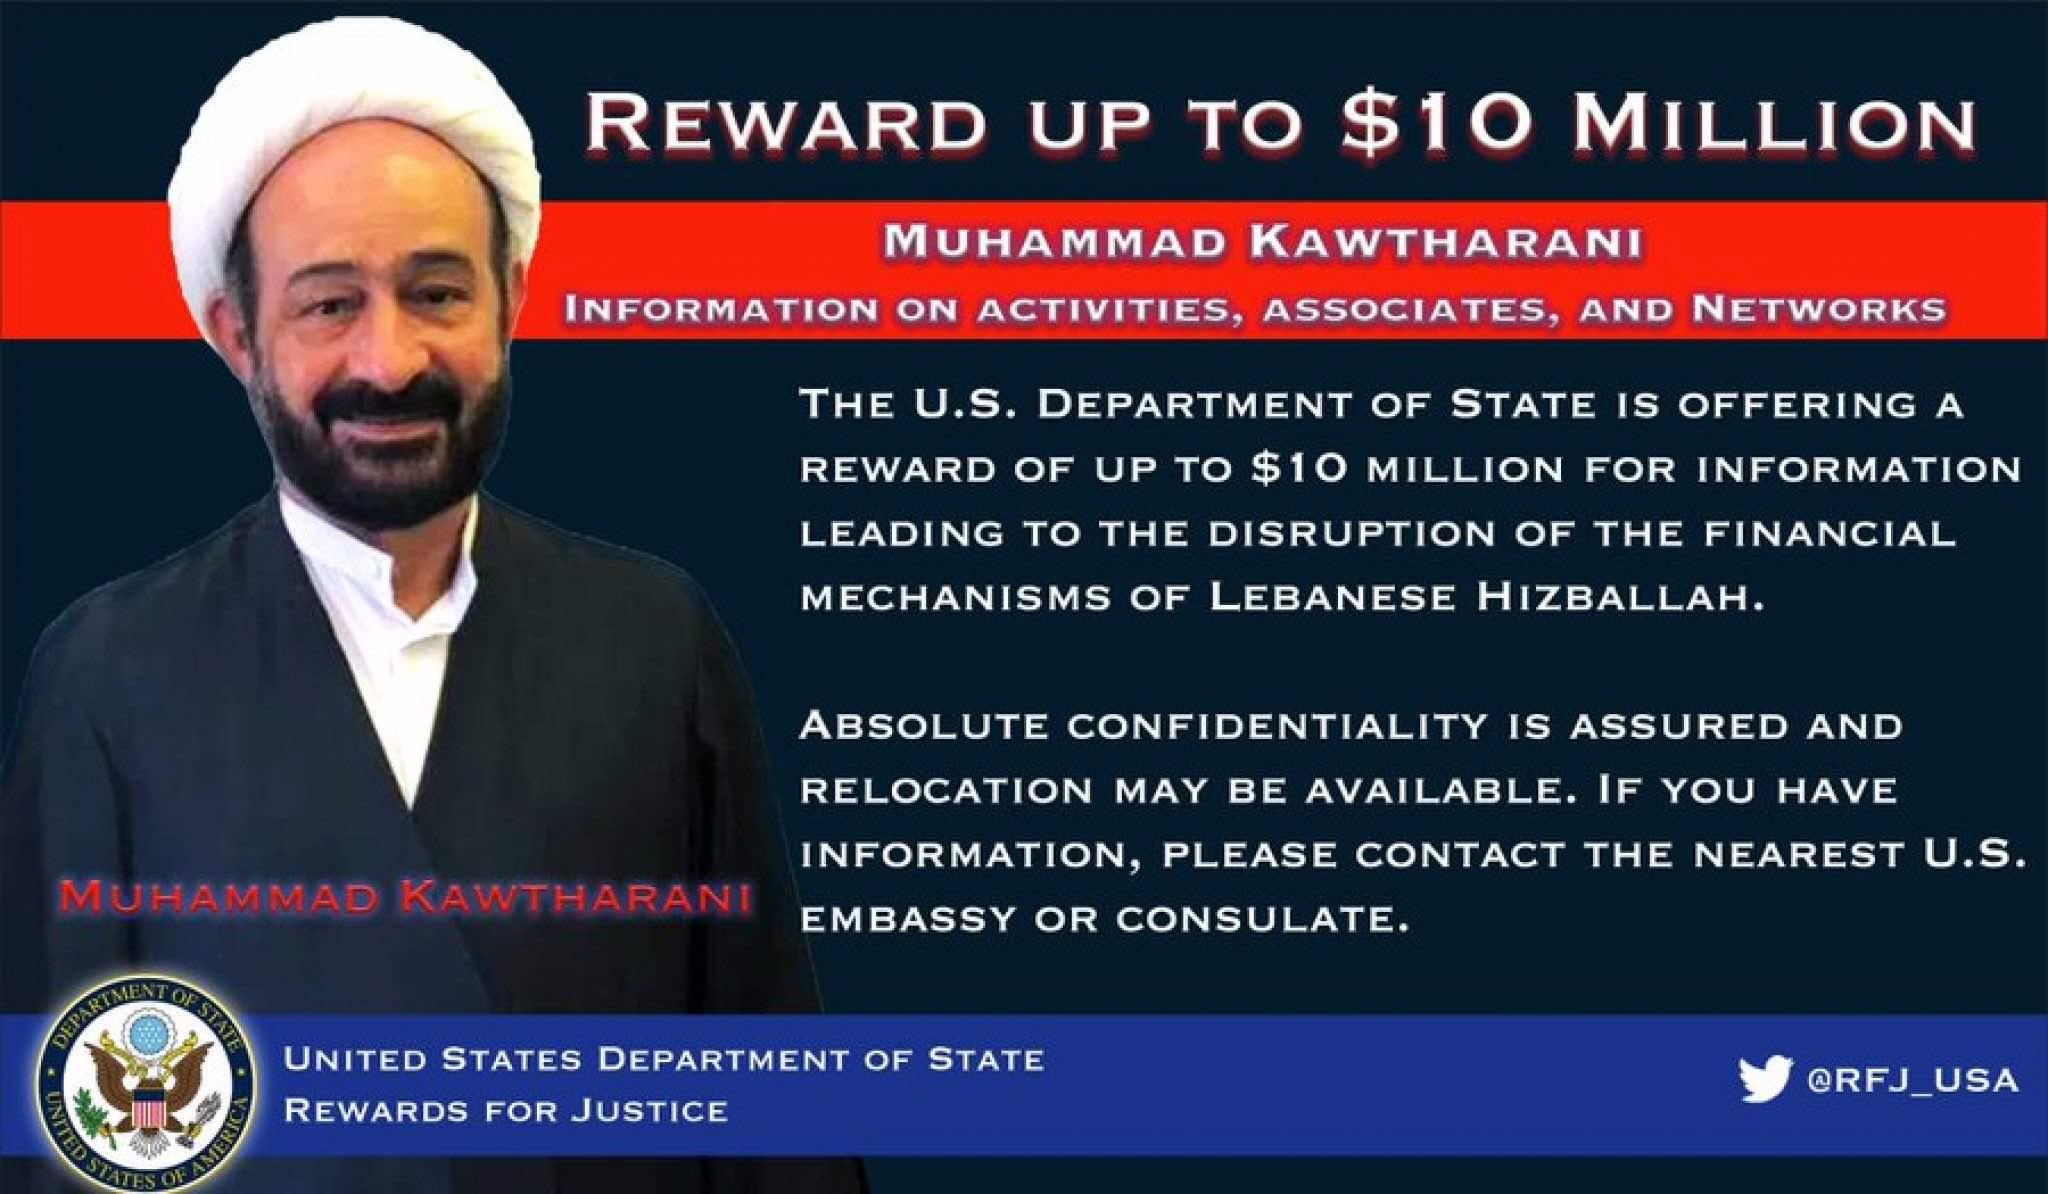 Muhammad Kawtharani